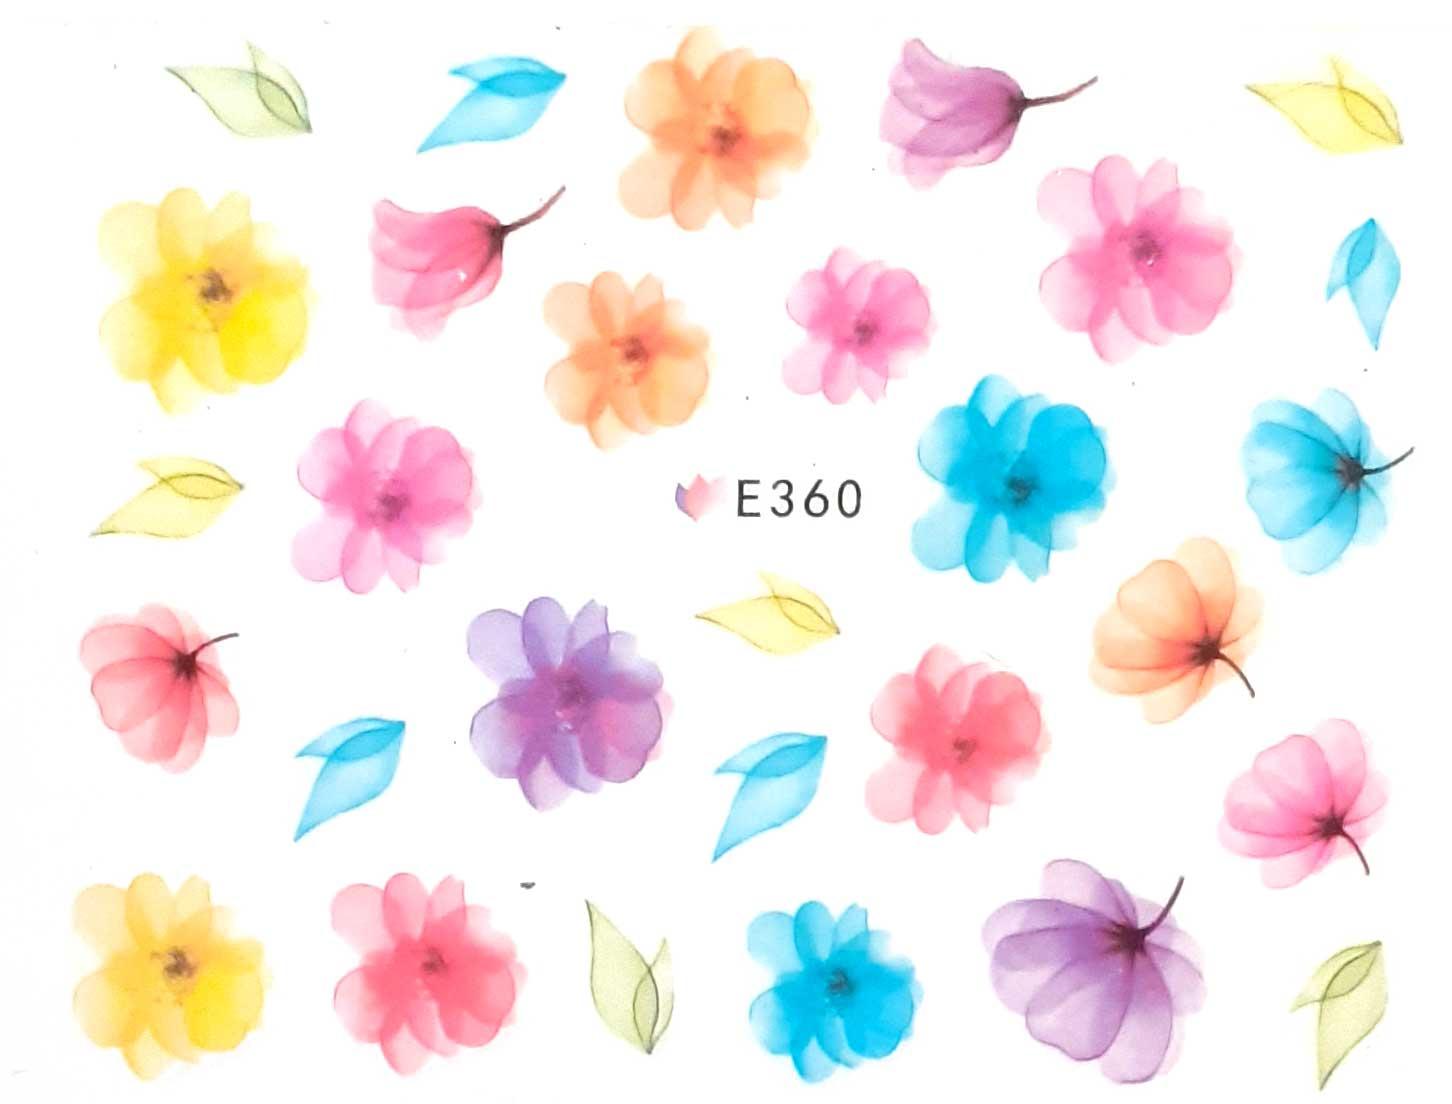 Nagelsticker Blumen pastell E-360 Nagelaufkleber, Nail Tattoo, Nail Sticker